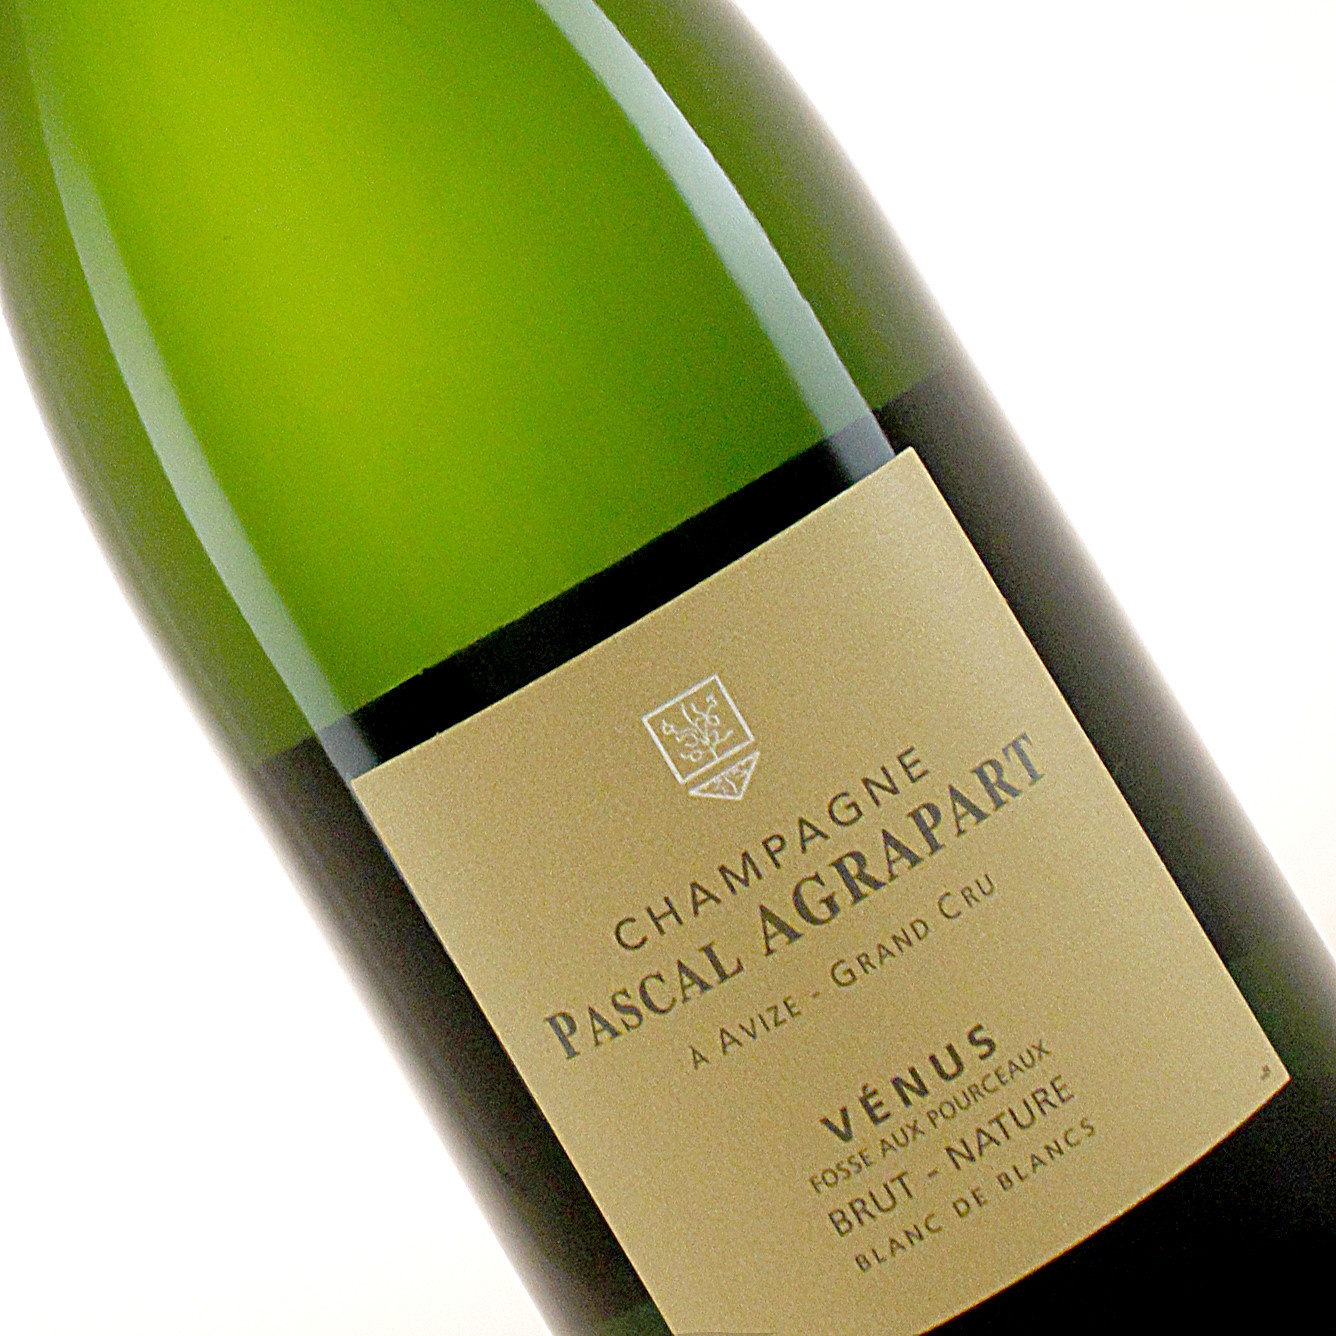 Agrapart & Fils 2009 Venus Blanc de Blancs Brut Nature, Champagne Grand Cru, Avize